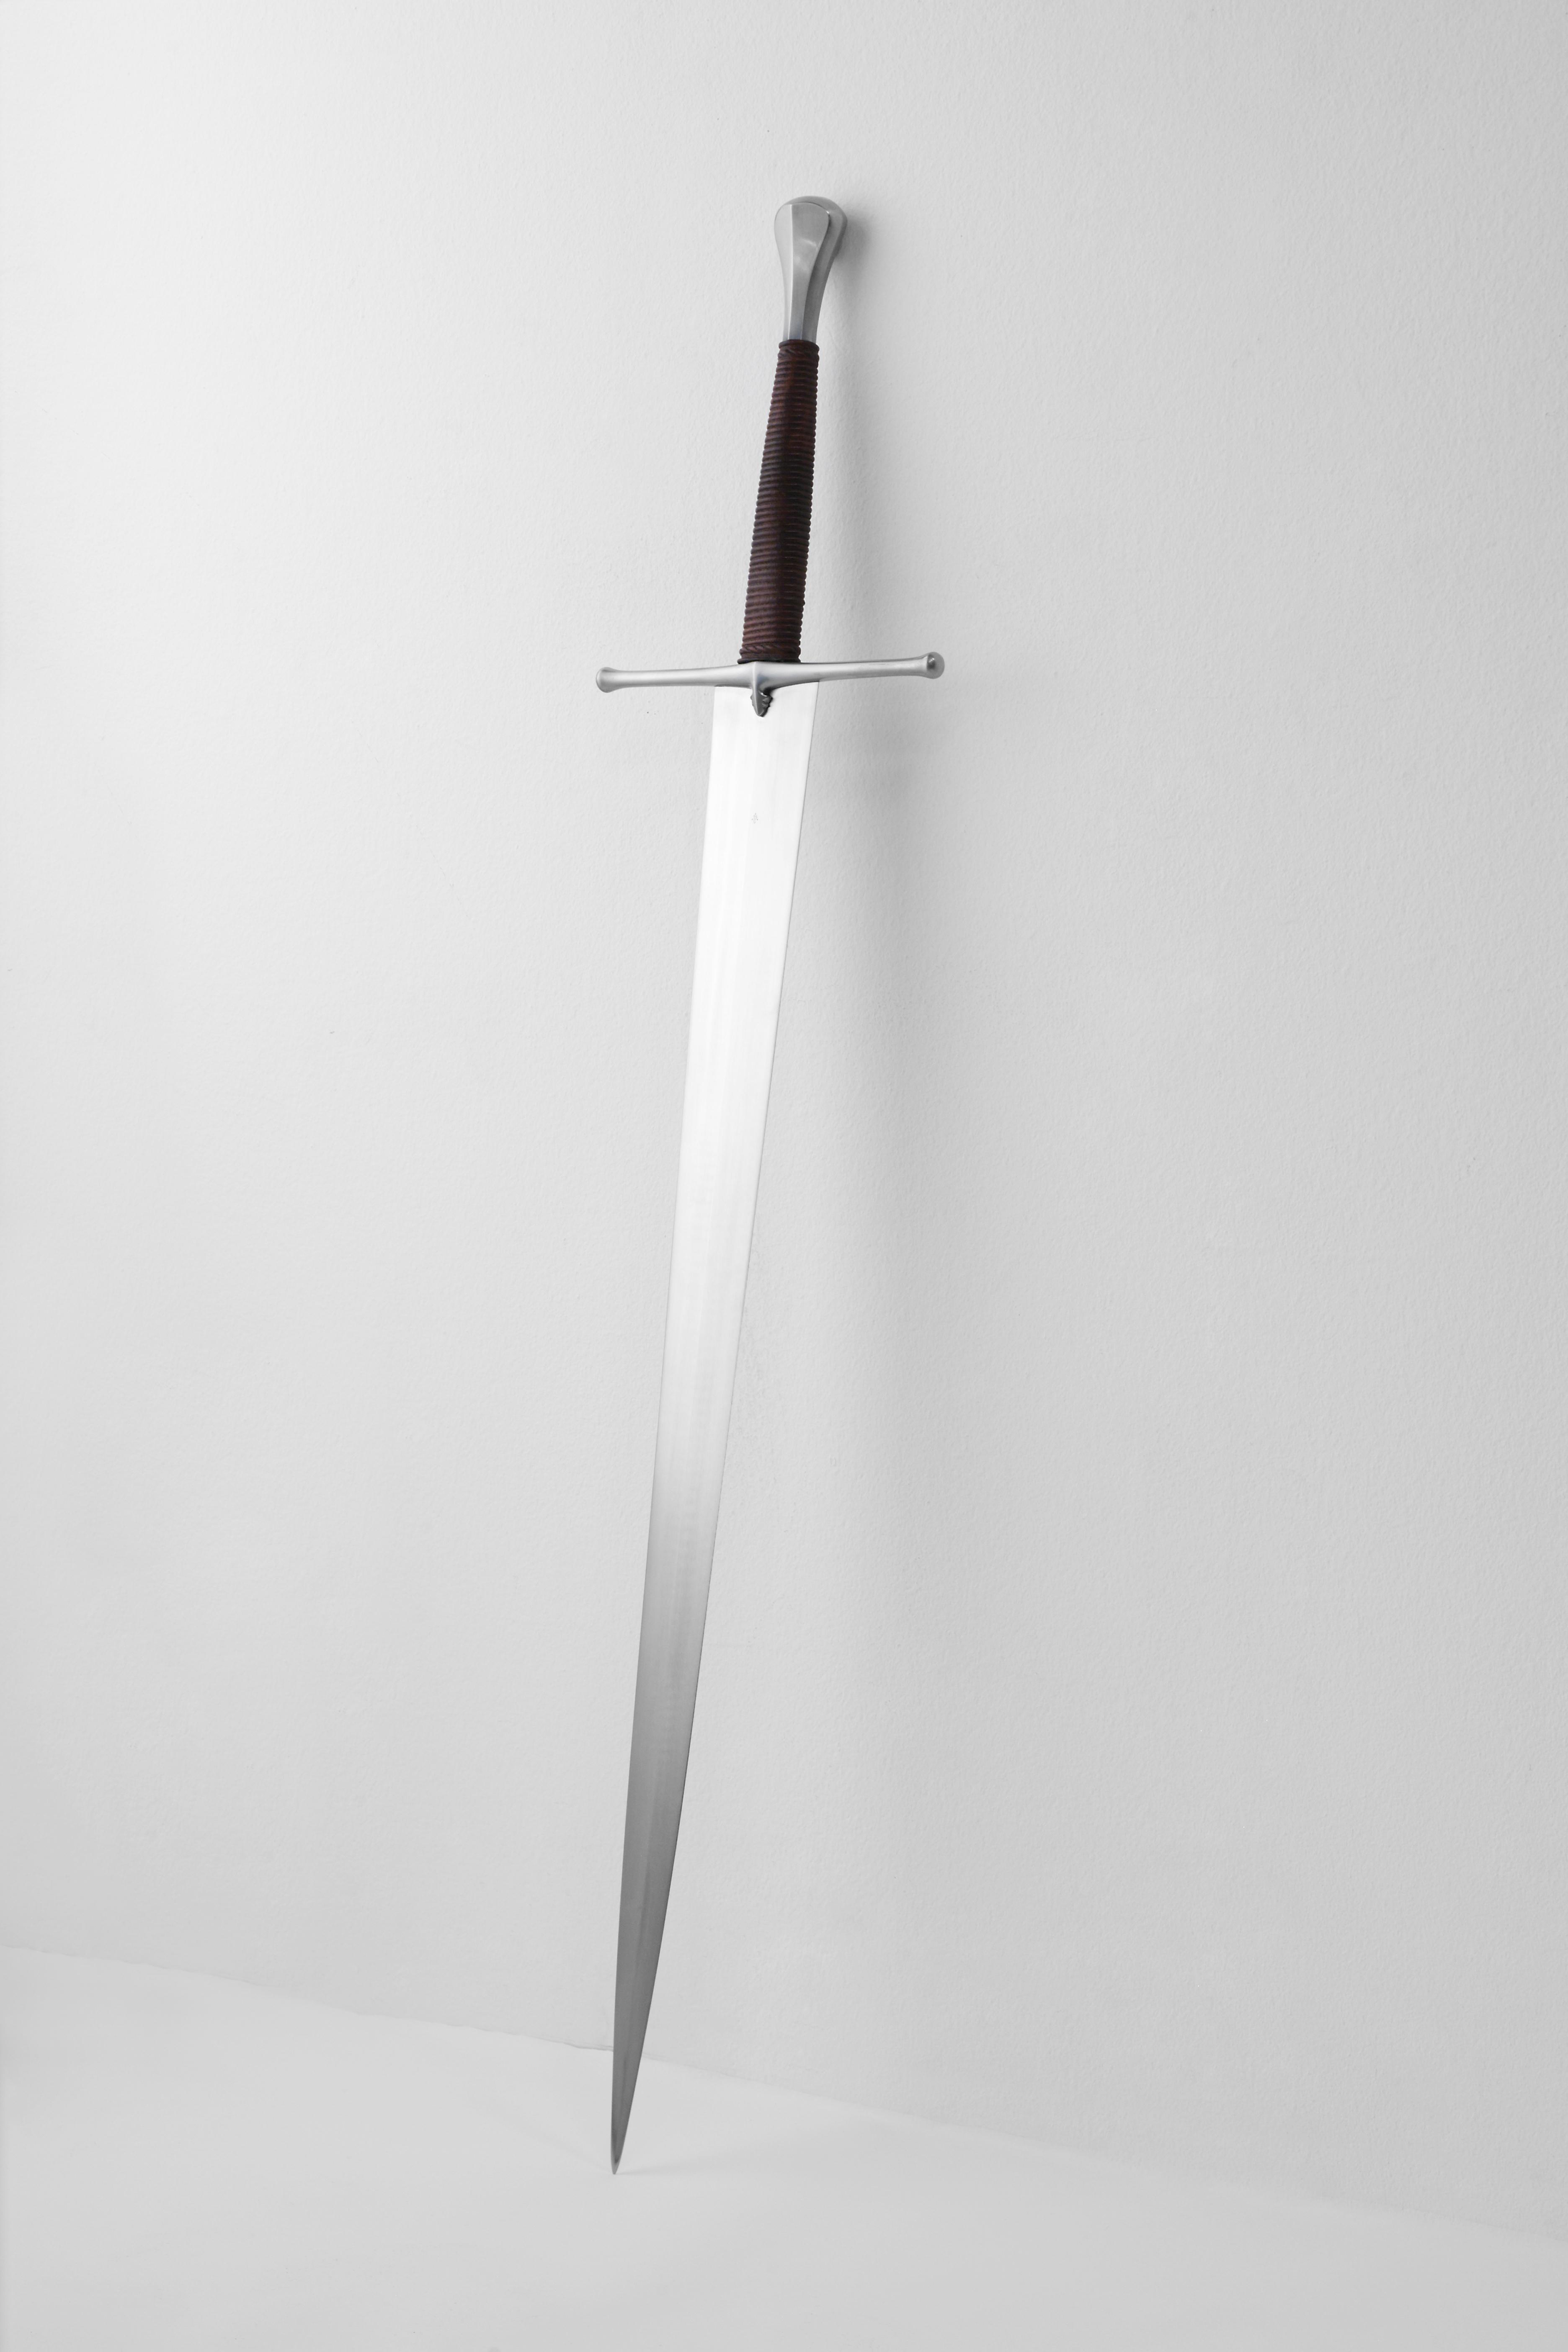 albion swords